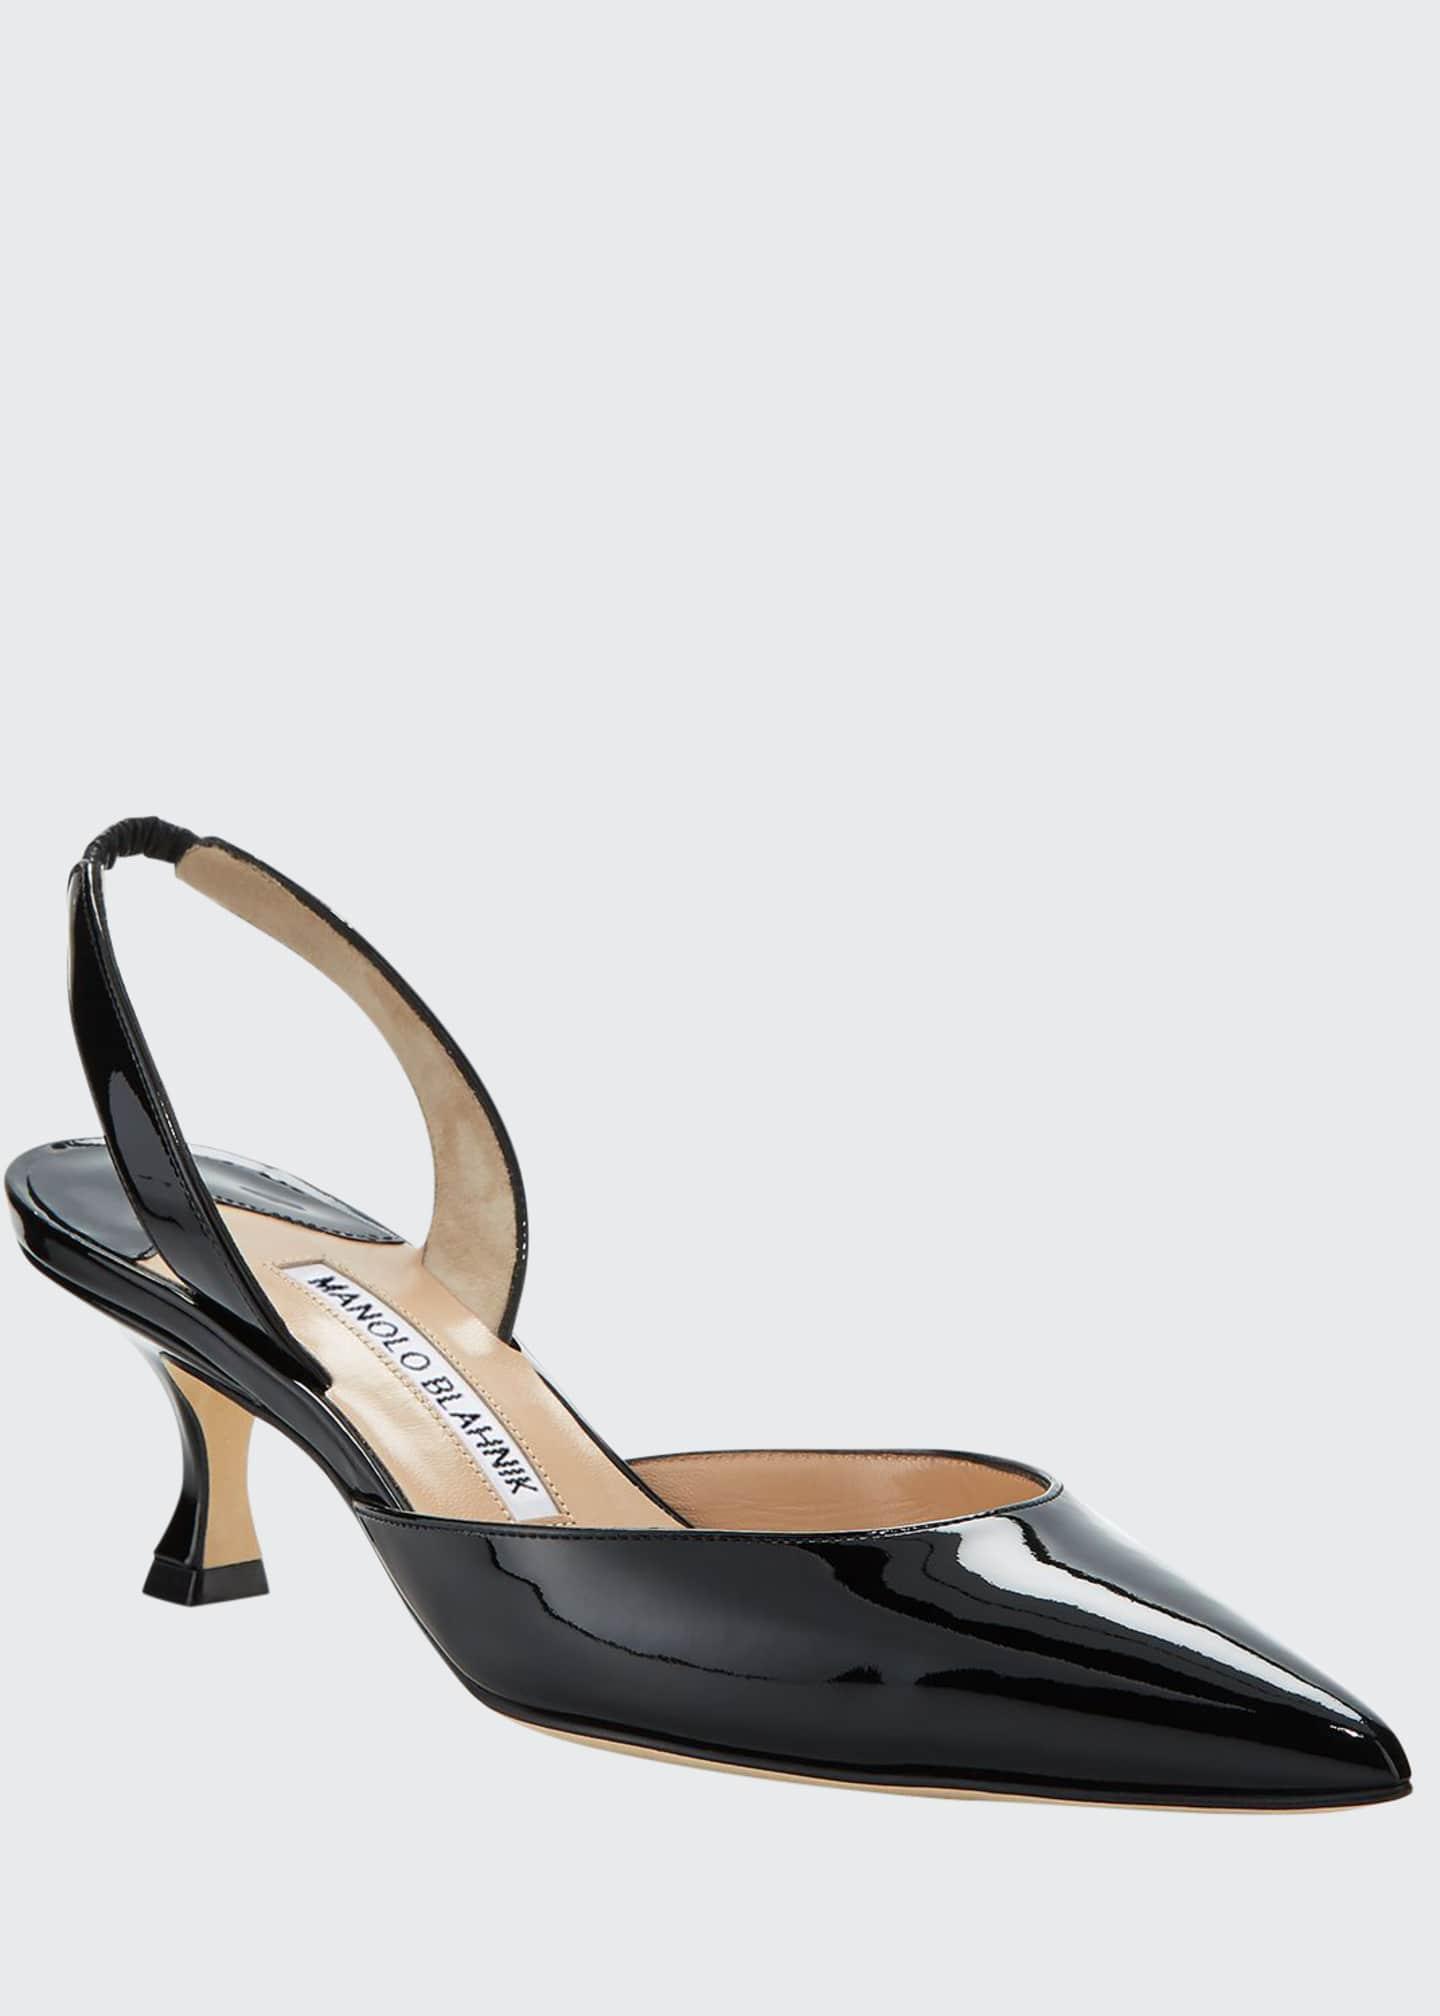 Manolo Blahnik Carolyne Low-Heel Patent Halter Pumps